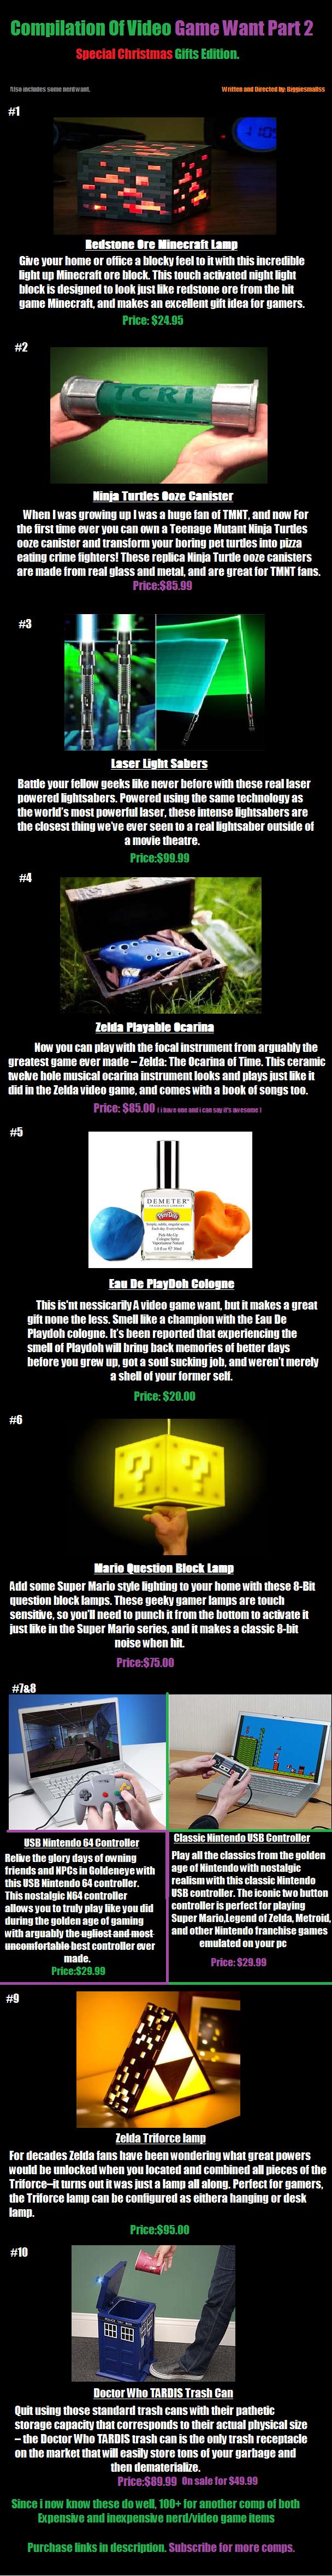 Part 2 Video game want comp. Ore Block www.thinkgeek.com/product/eea7/?cpg=cj&ref=&CJURL=&CJID=3363563 Ooze Canister www.etsy.com/listing/108649032/ vidja games want